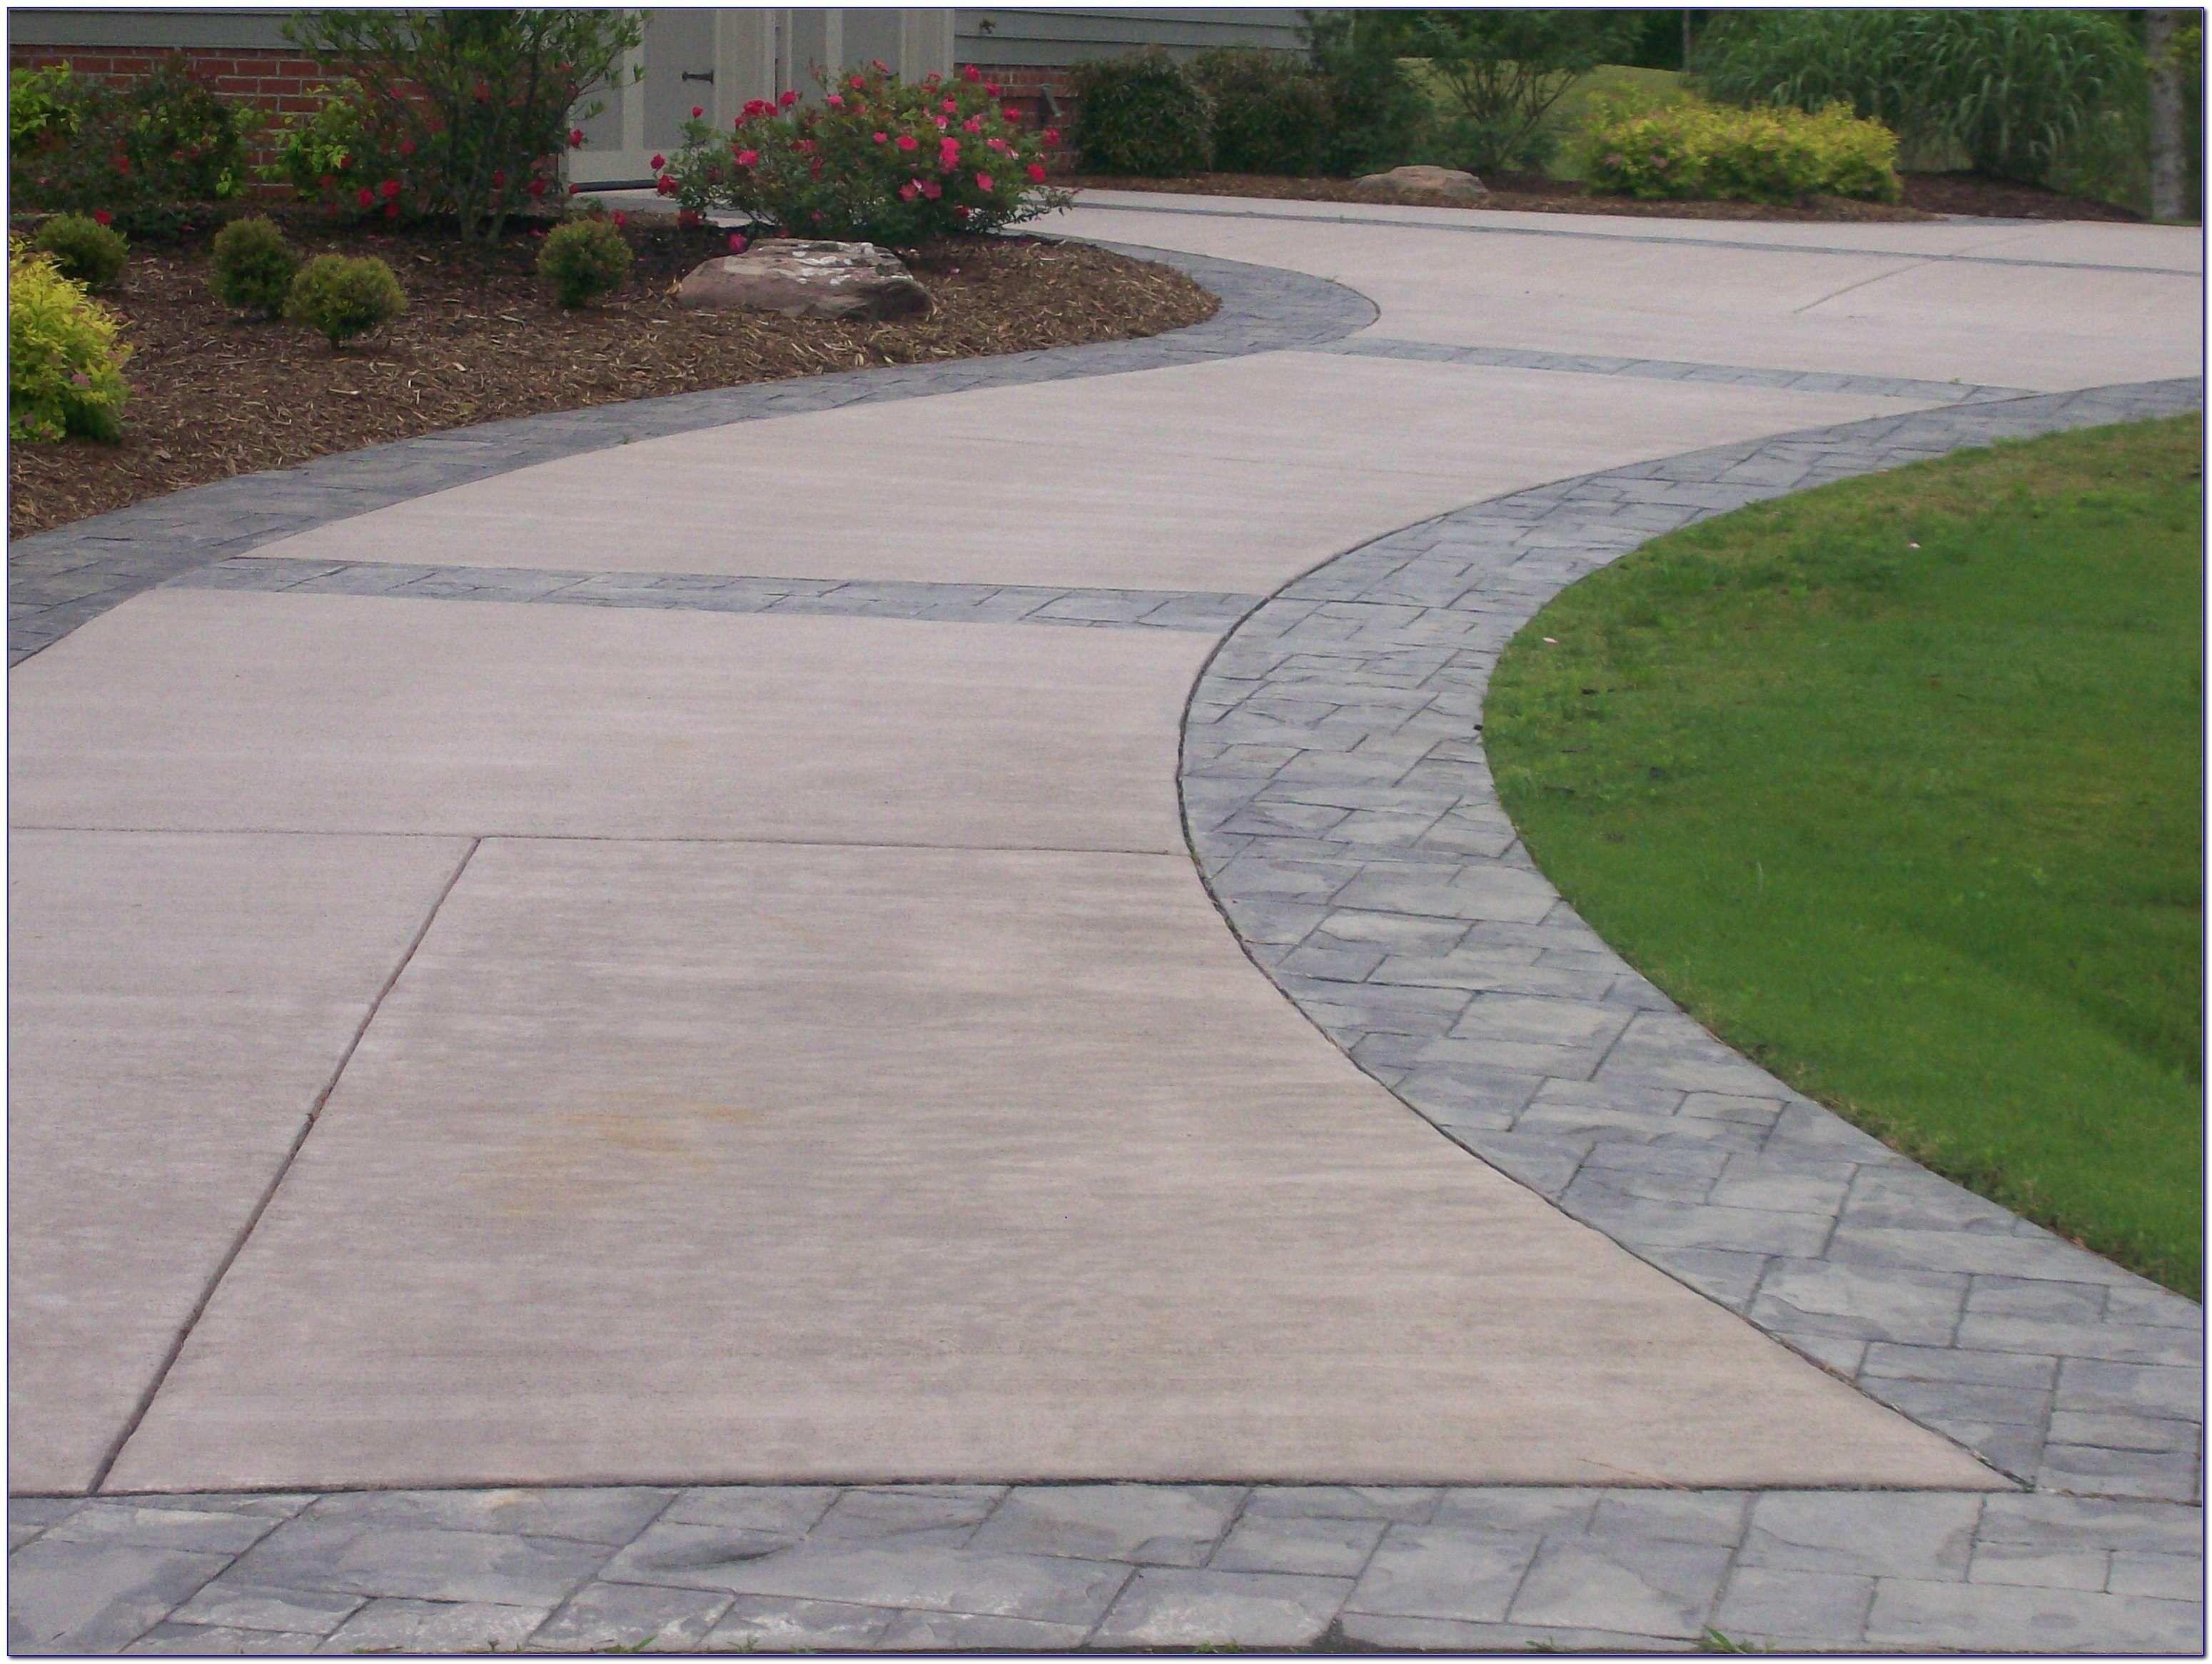 Pin By Elizabeth Lambert On Garden Stamped Concrete Driveway